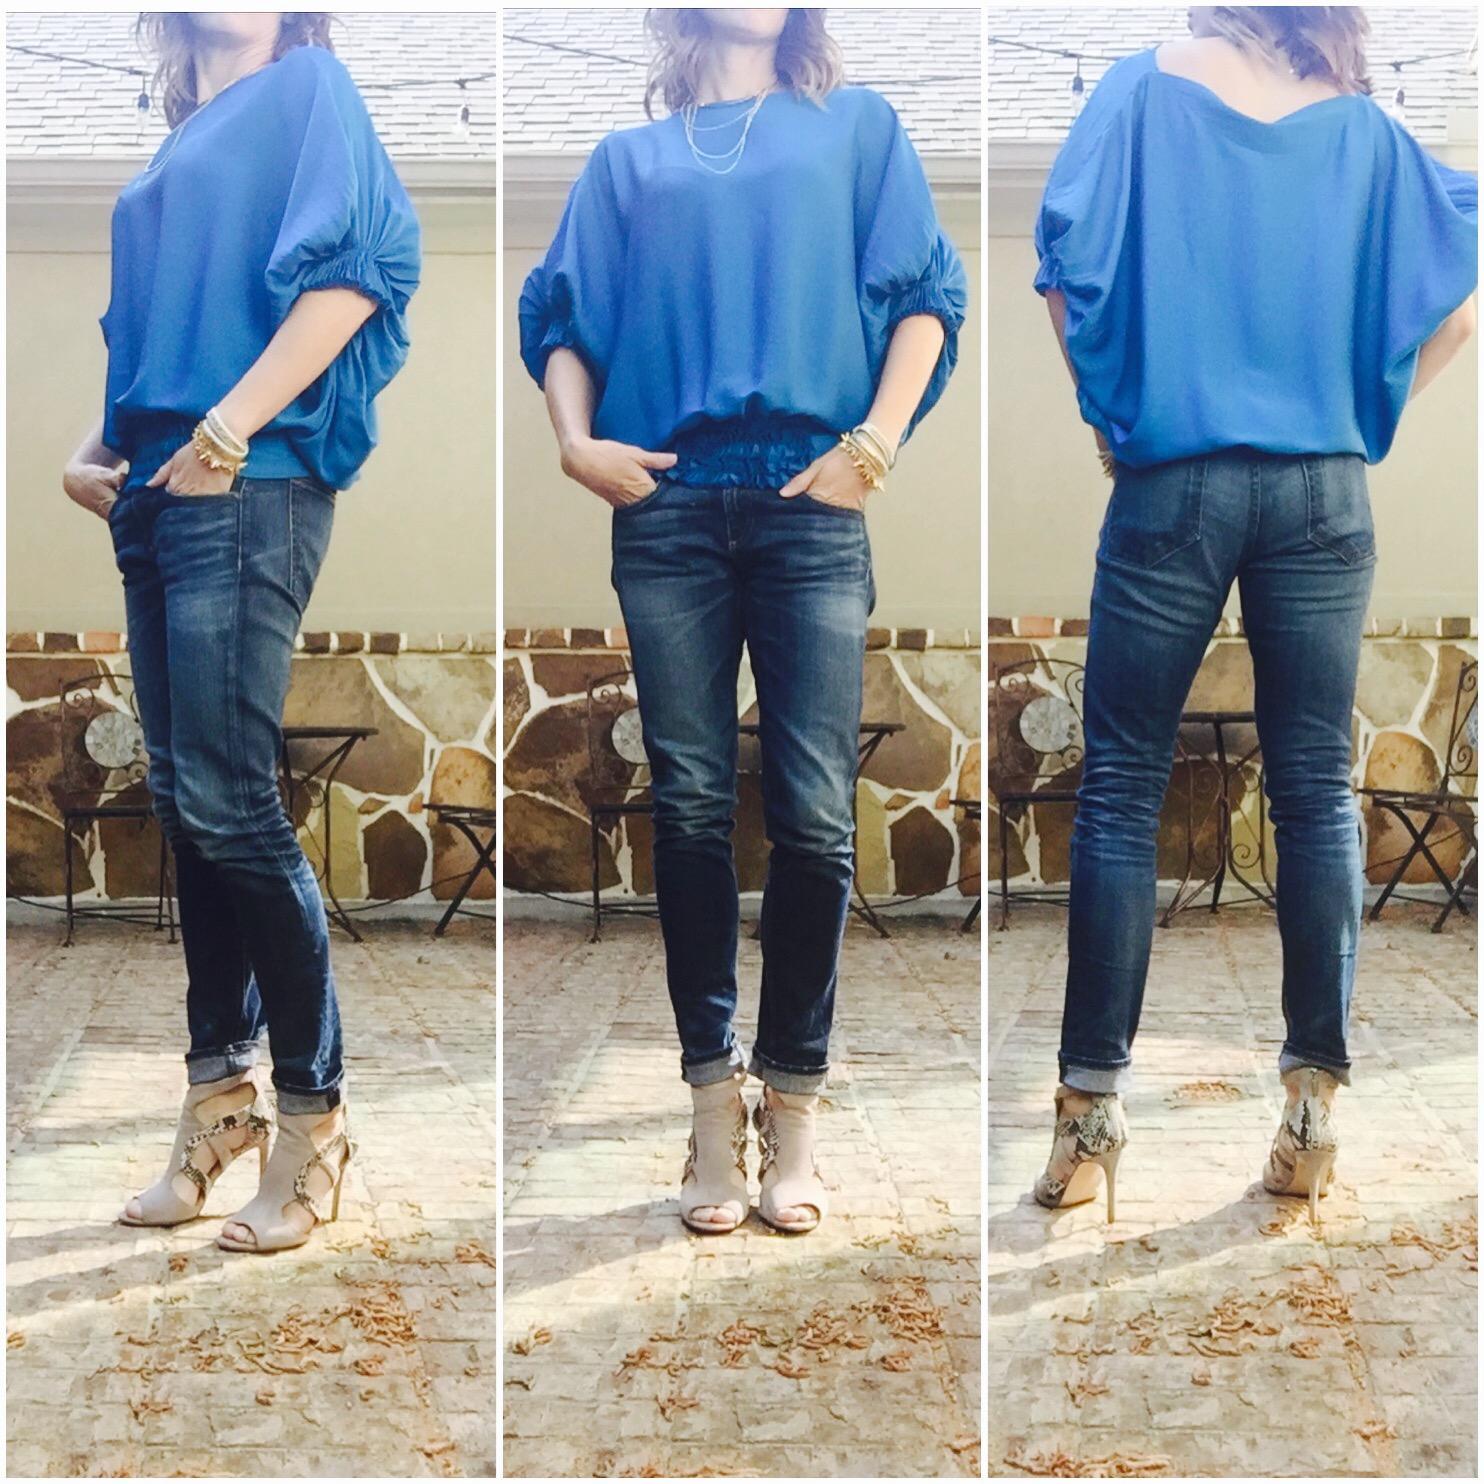 diane von furstenberg, blue, blouse, everyday style, method39, style advisor, how to wear it